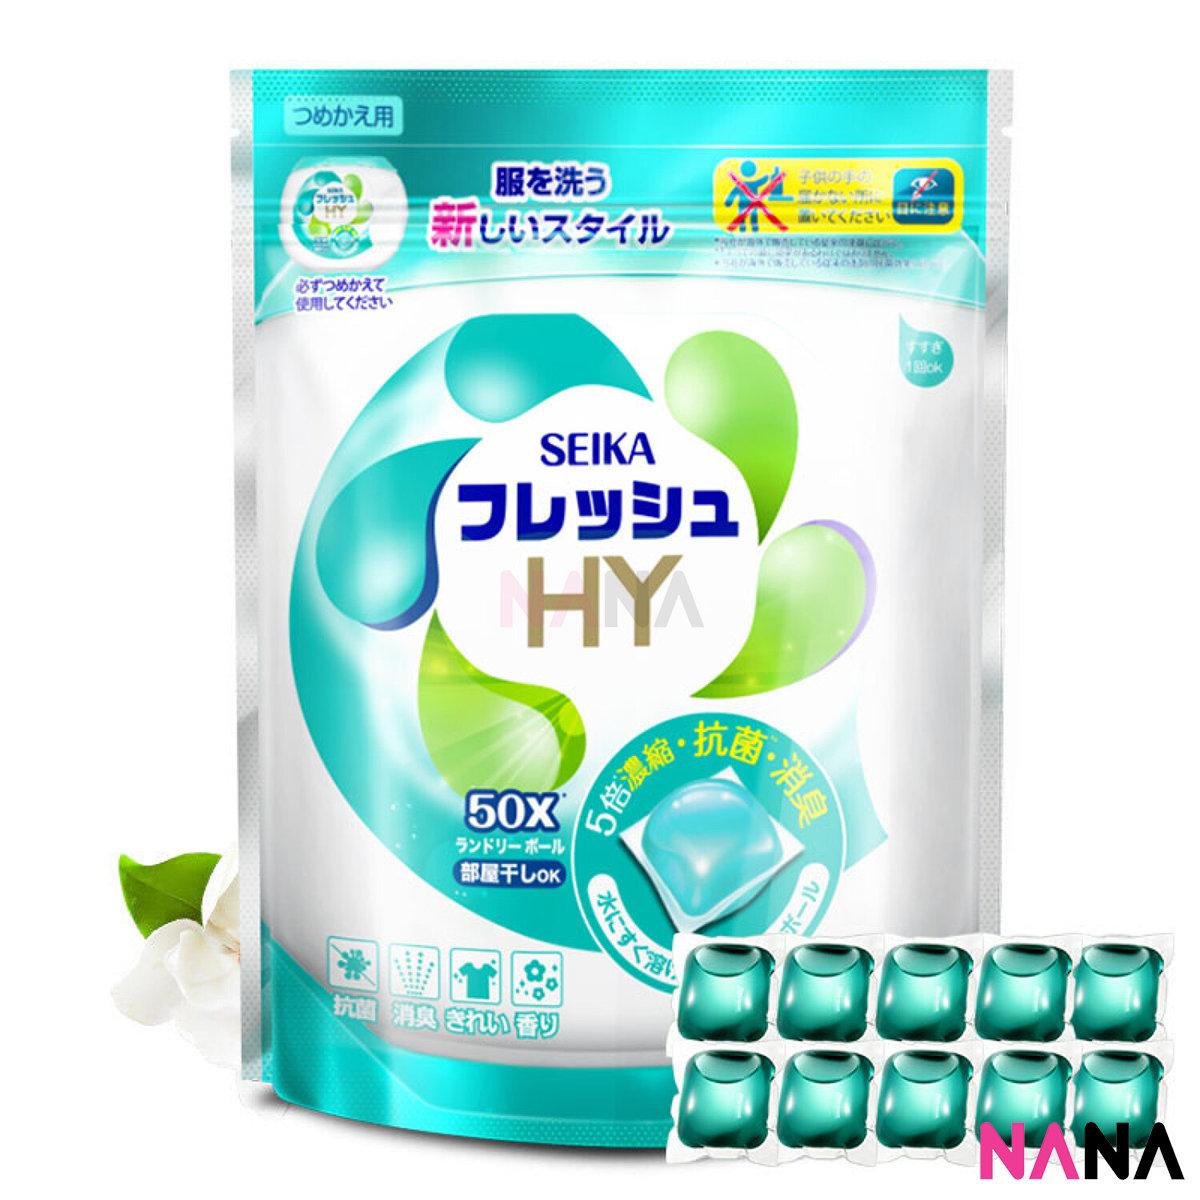 Seika Fresh HY 50X Anti-Bact Laundry Capsule (36Caps/ Bag)